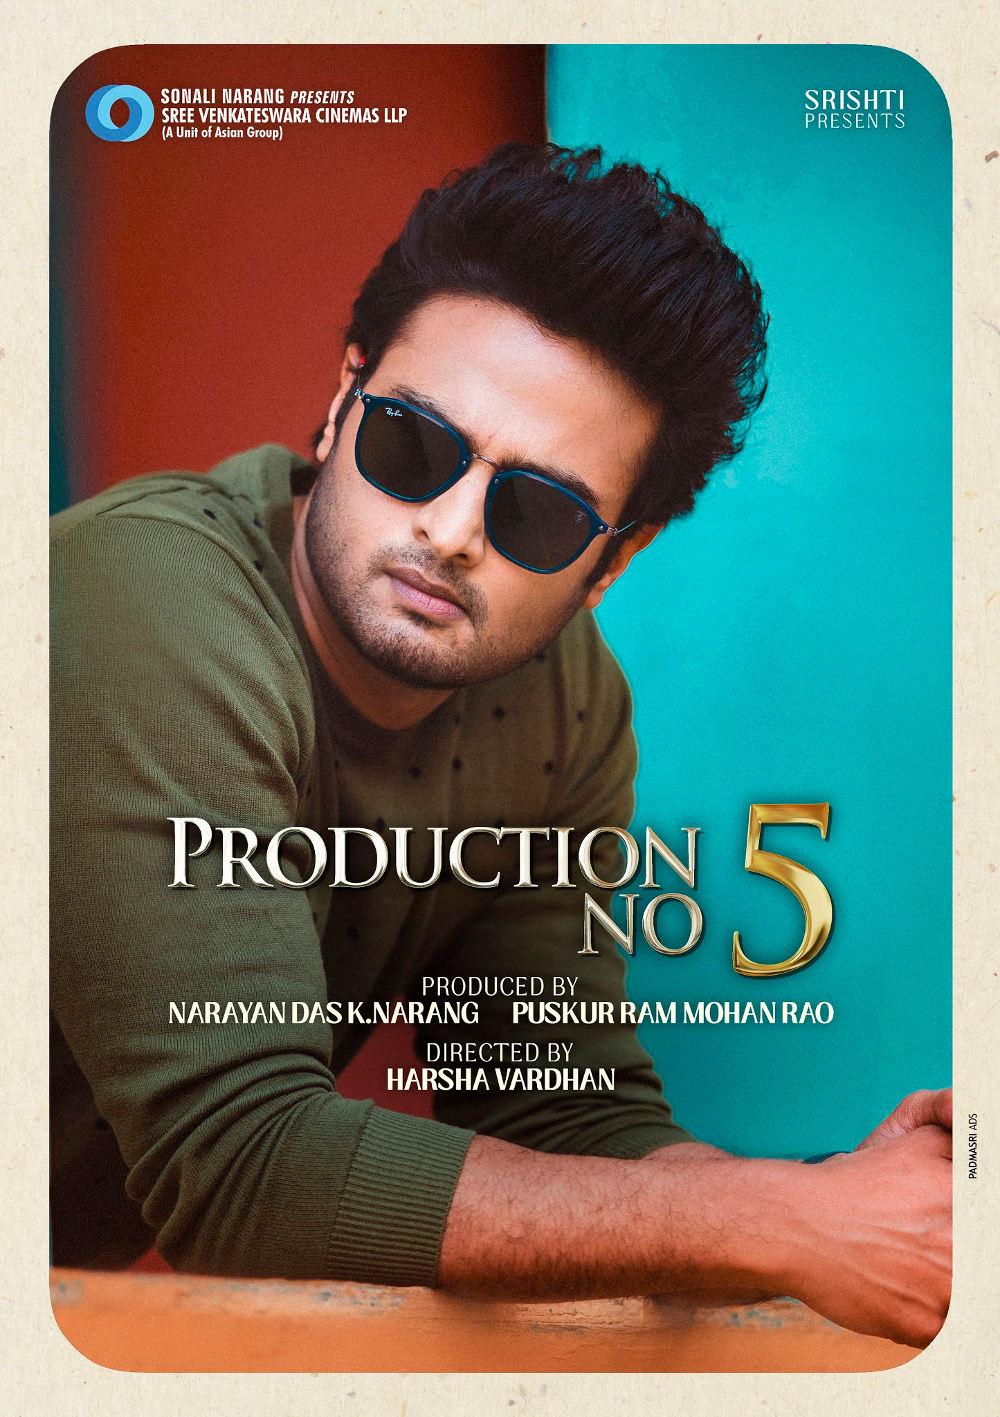 Sudheer Babu Harsha Vardhan Sree Venkateswara Cinemas LLP Production No 5 Announced